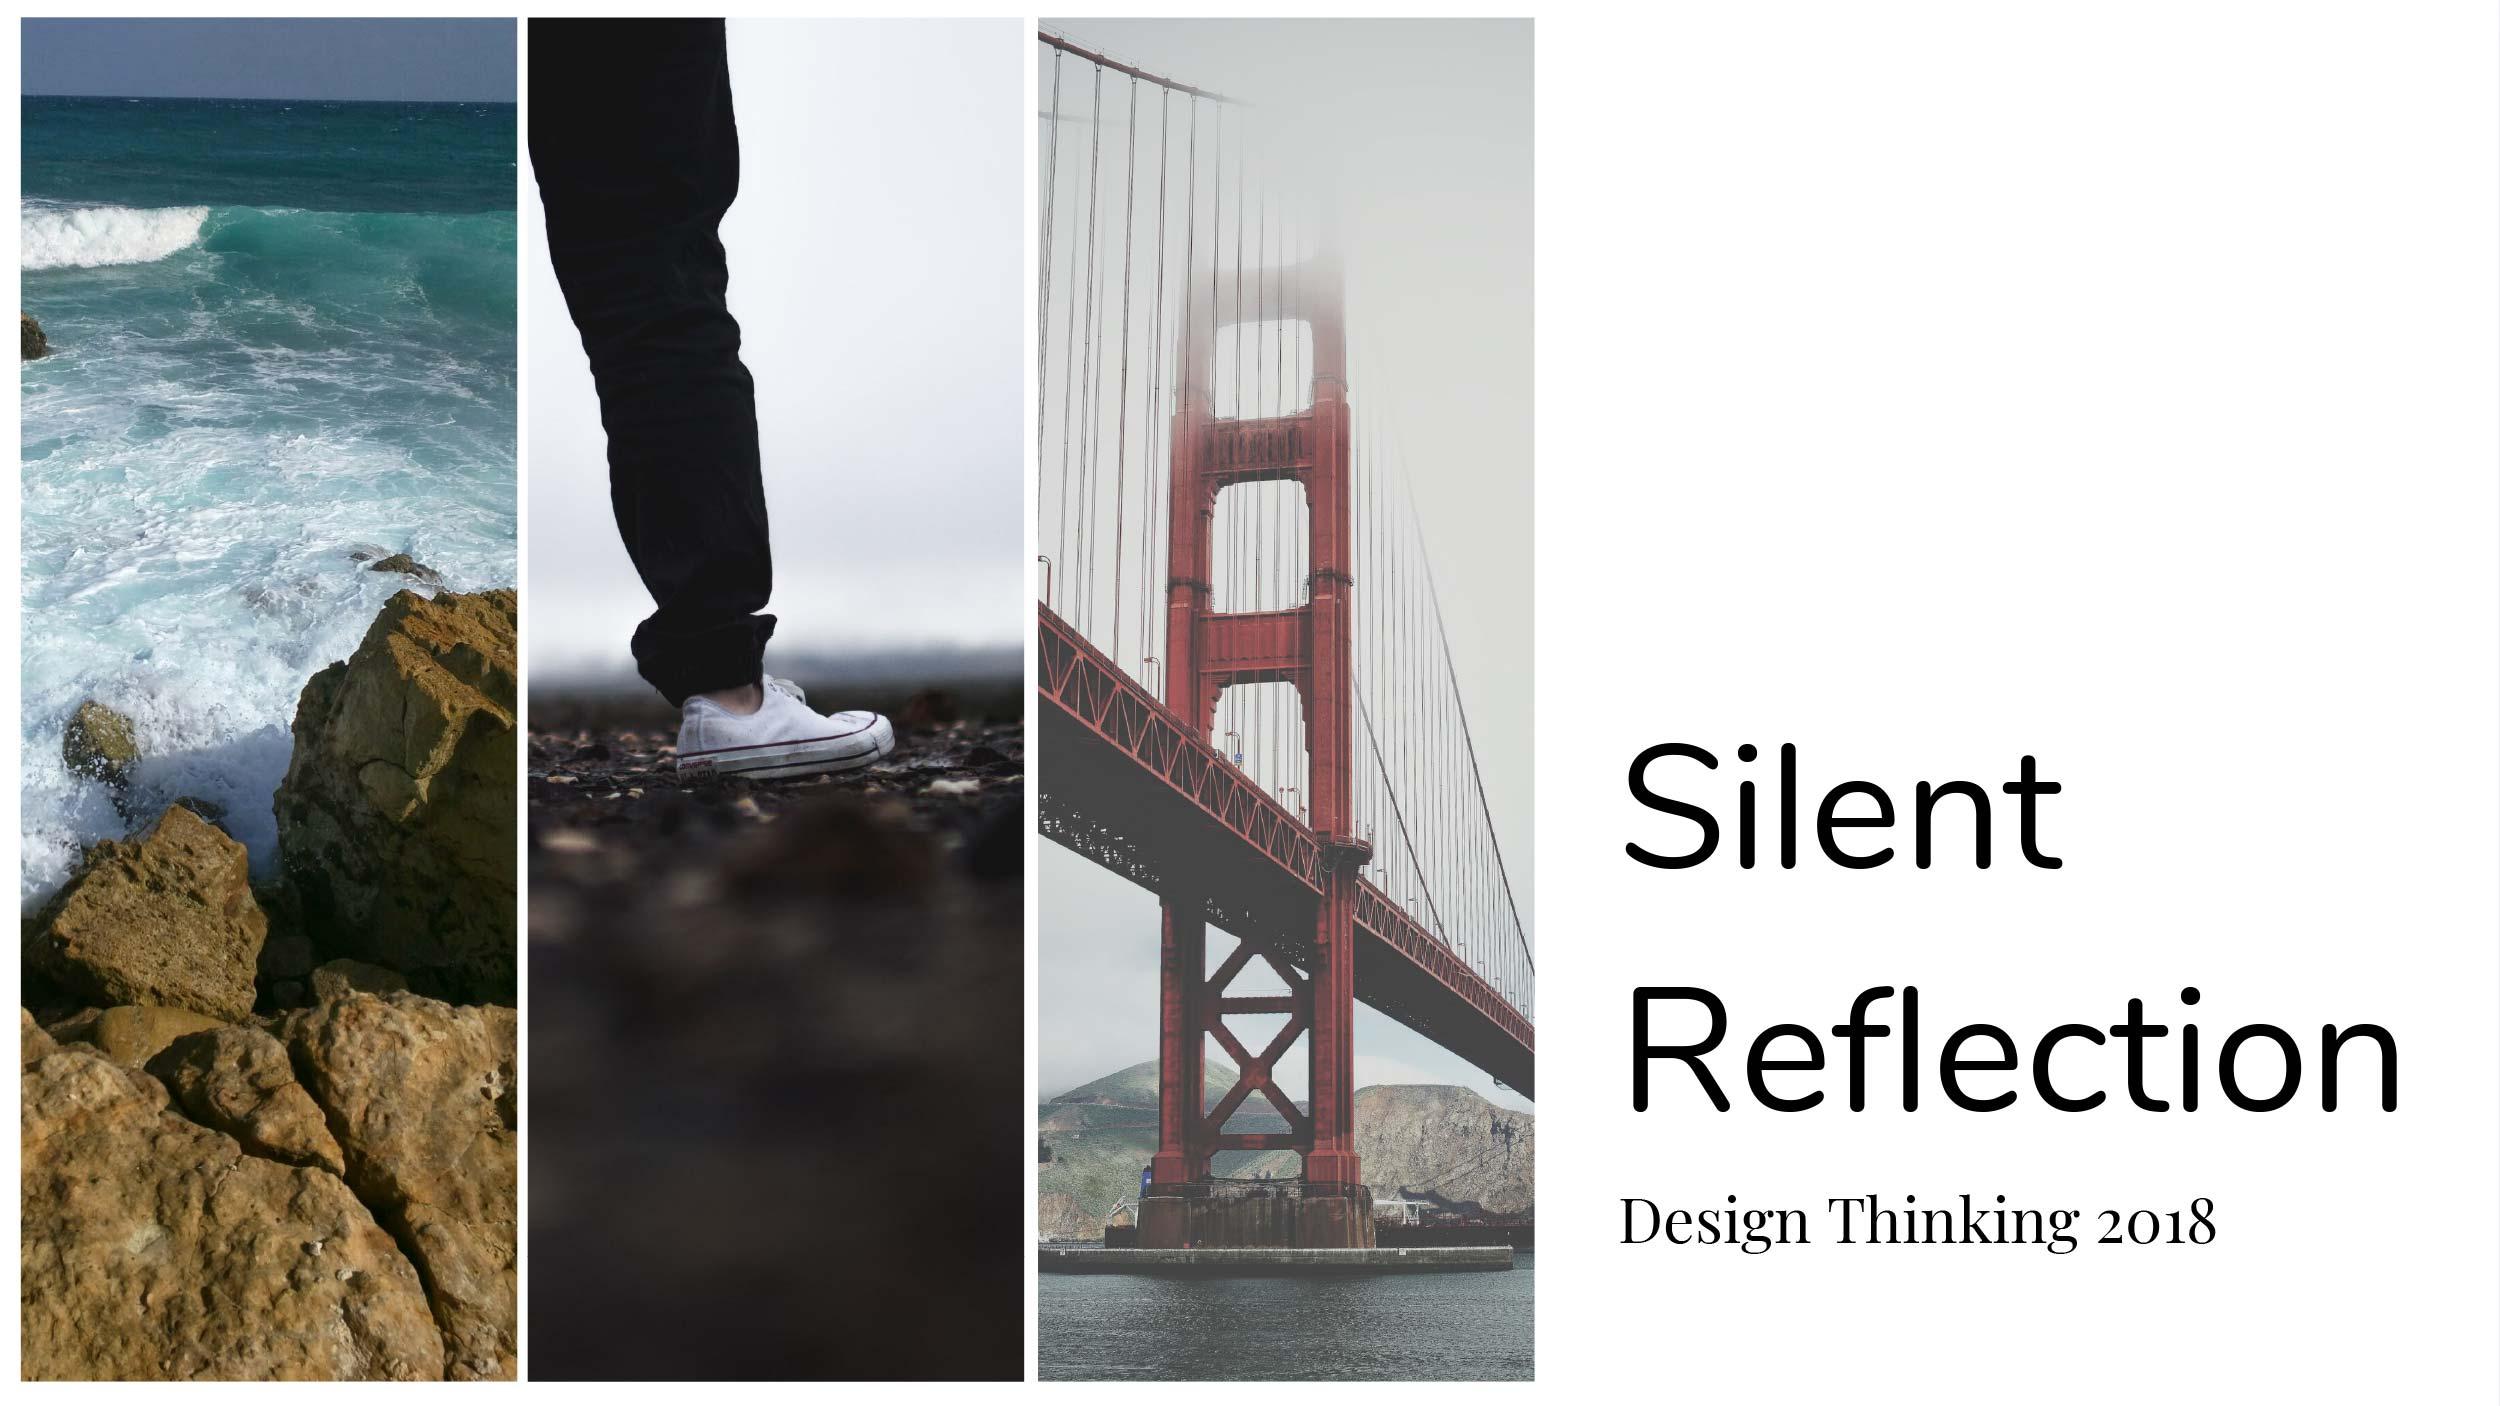 cnx-silentreflection-1.jpg